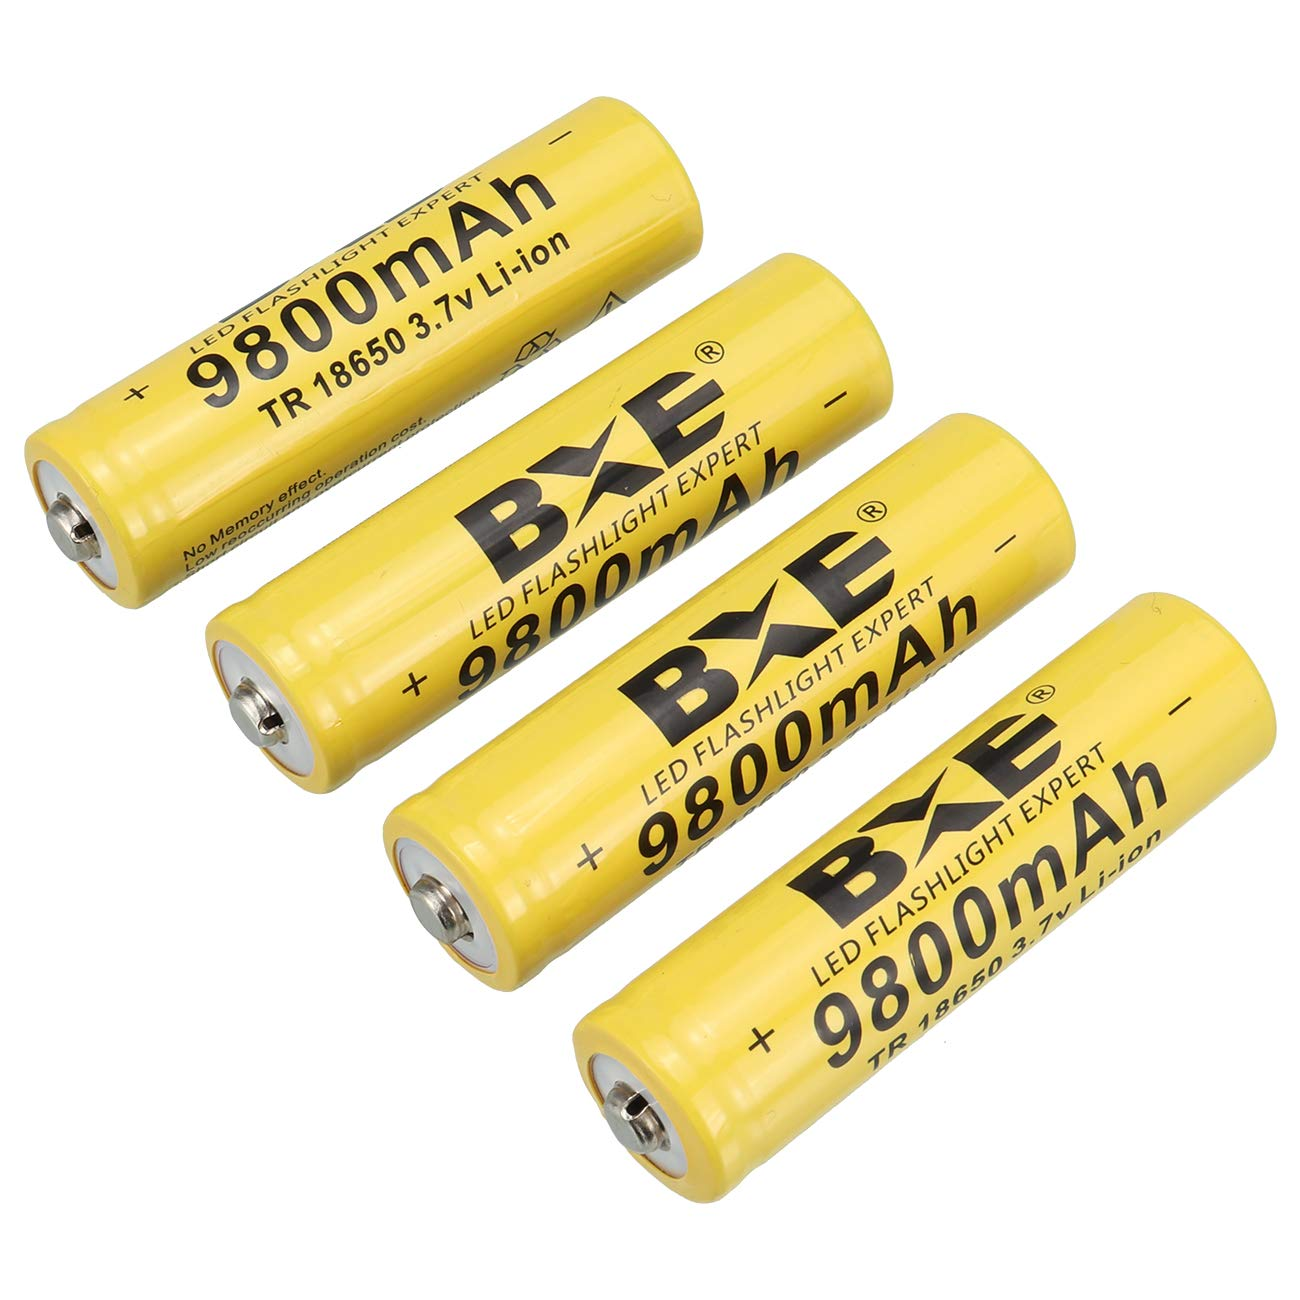 Household Appliance BXE Lightbole 8PCS Li-ion Rechargeable 18650 Batteries 3.7V 5800AMH for Led Flashlight Toys